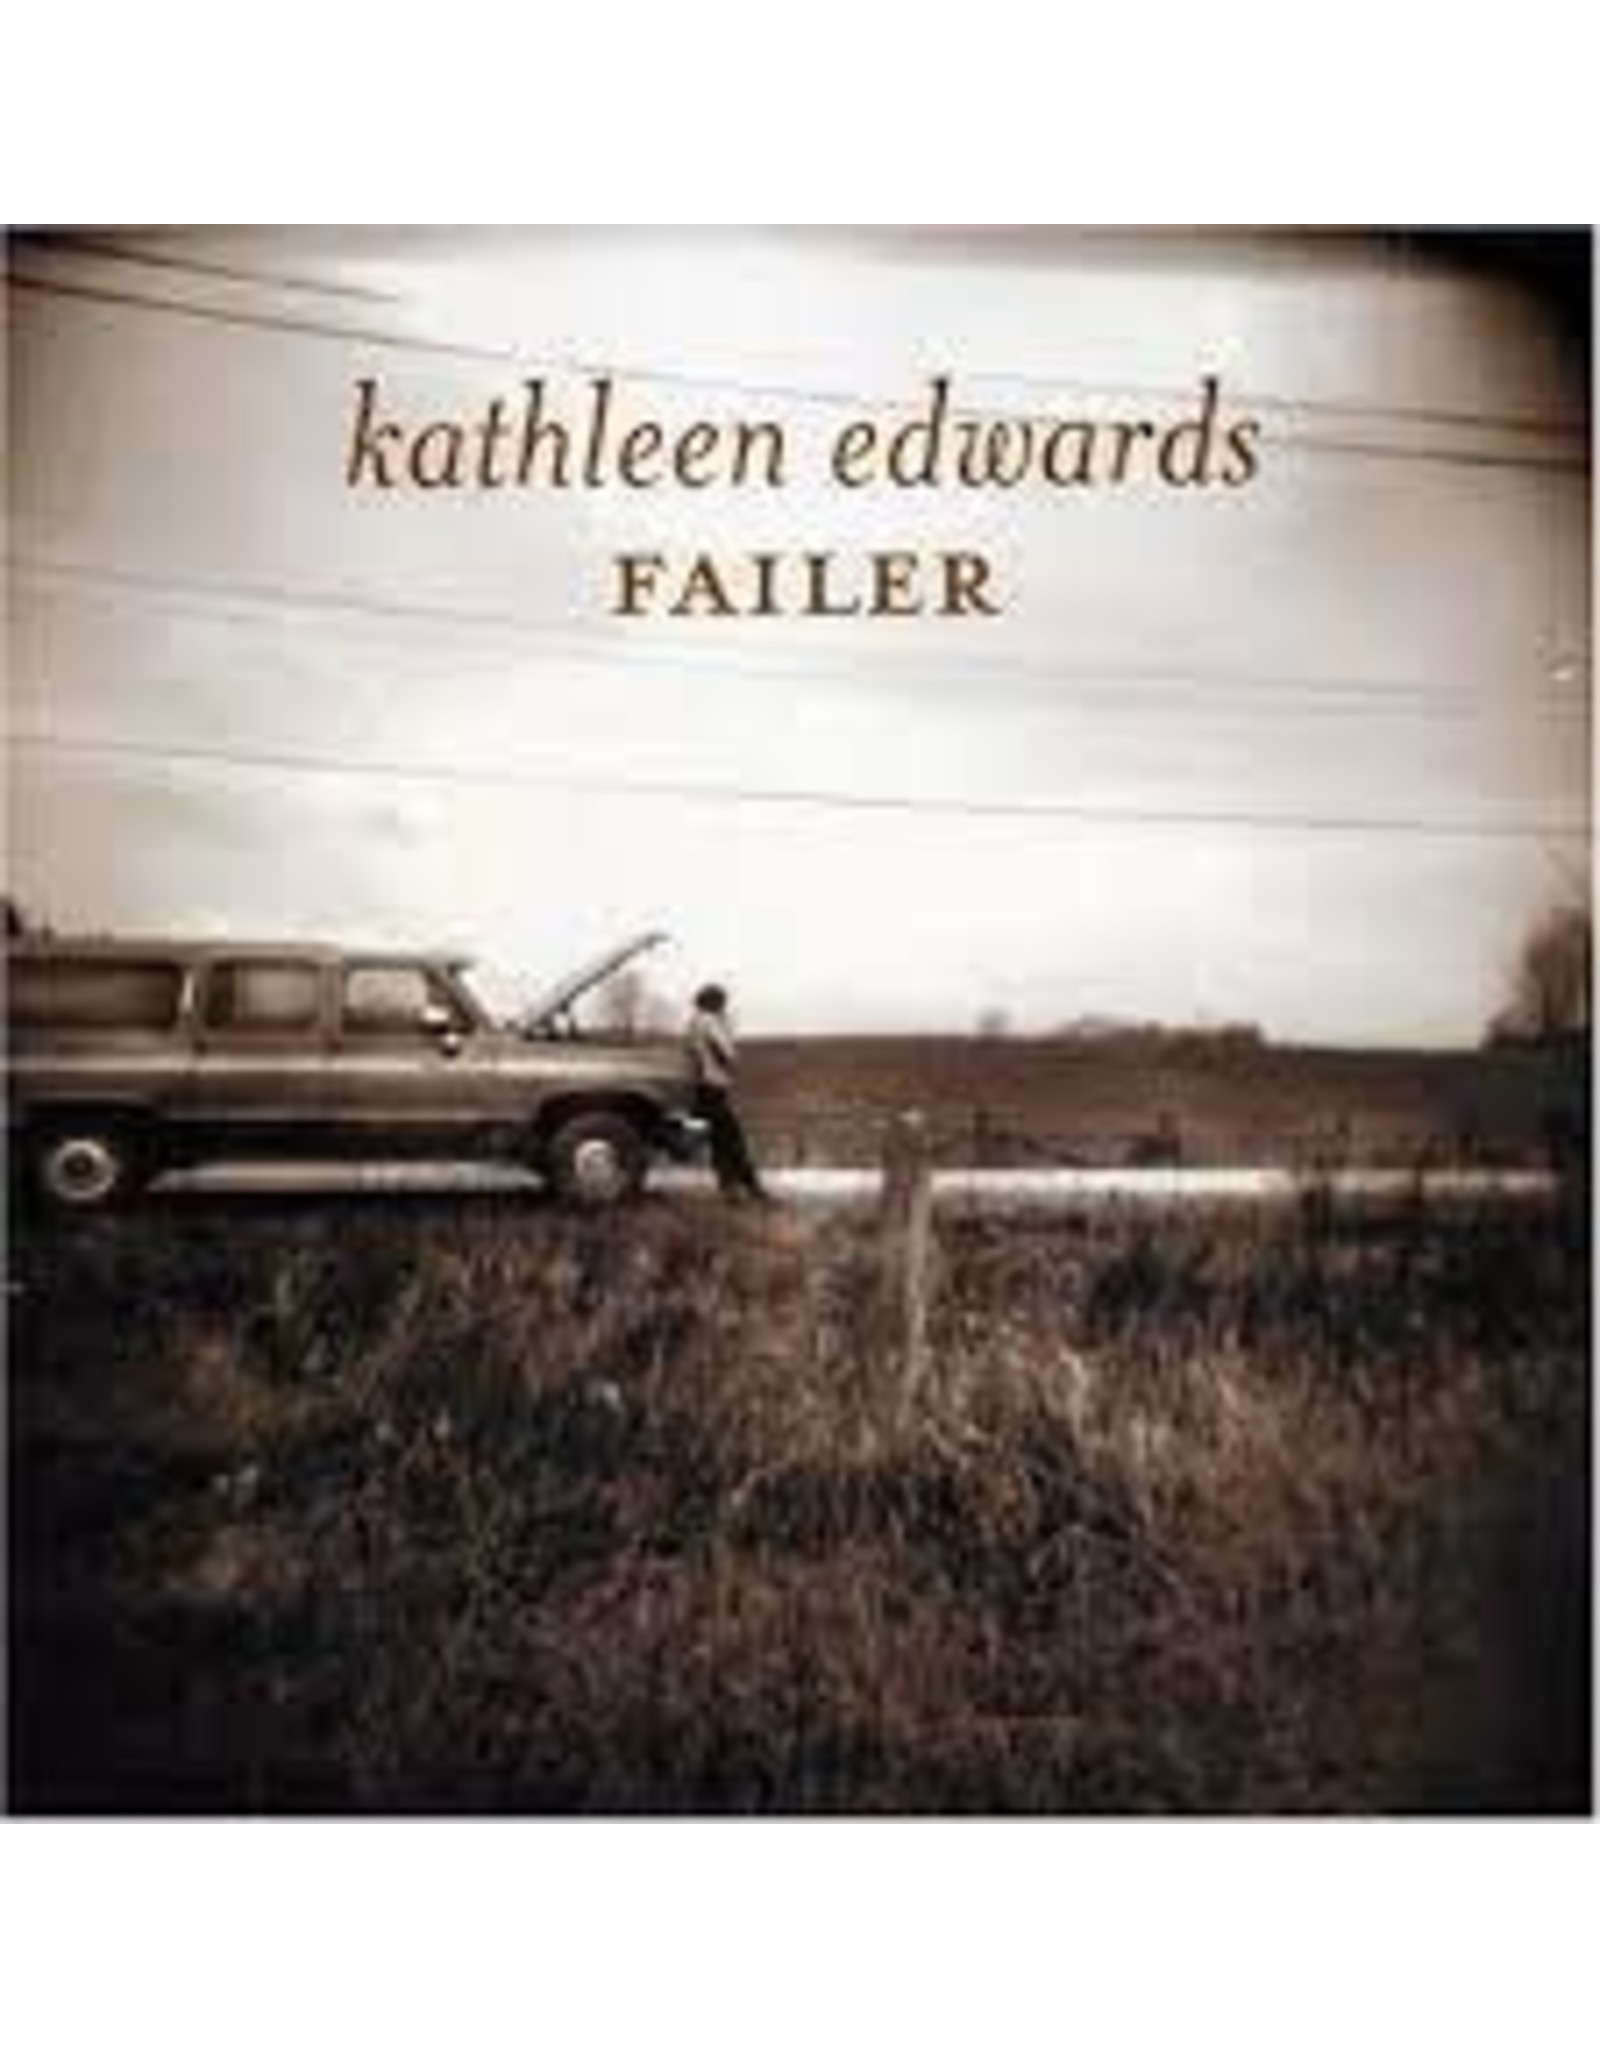 Edwards, Kathleen - Failer LP